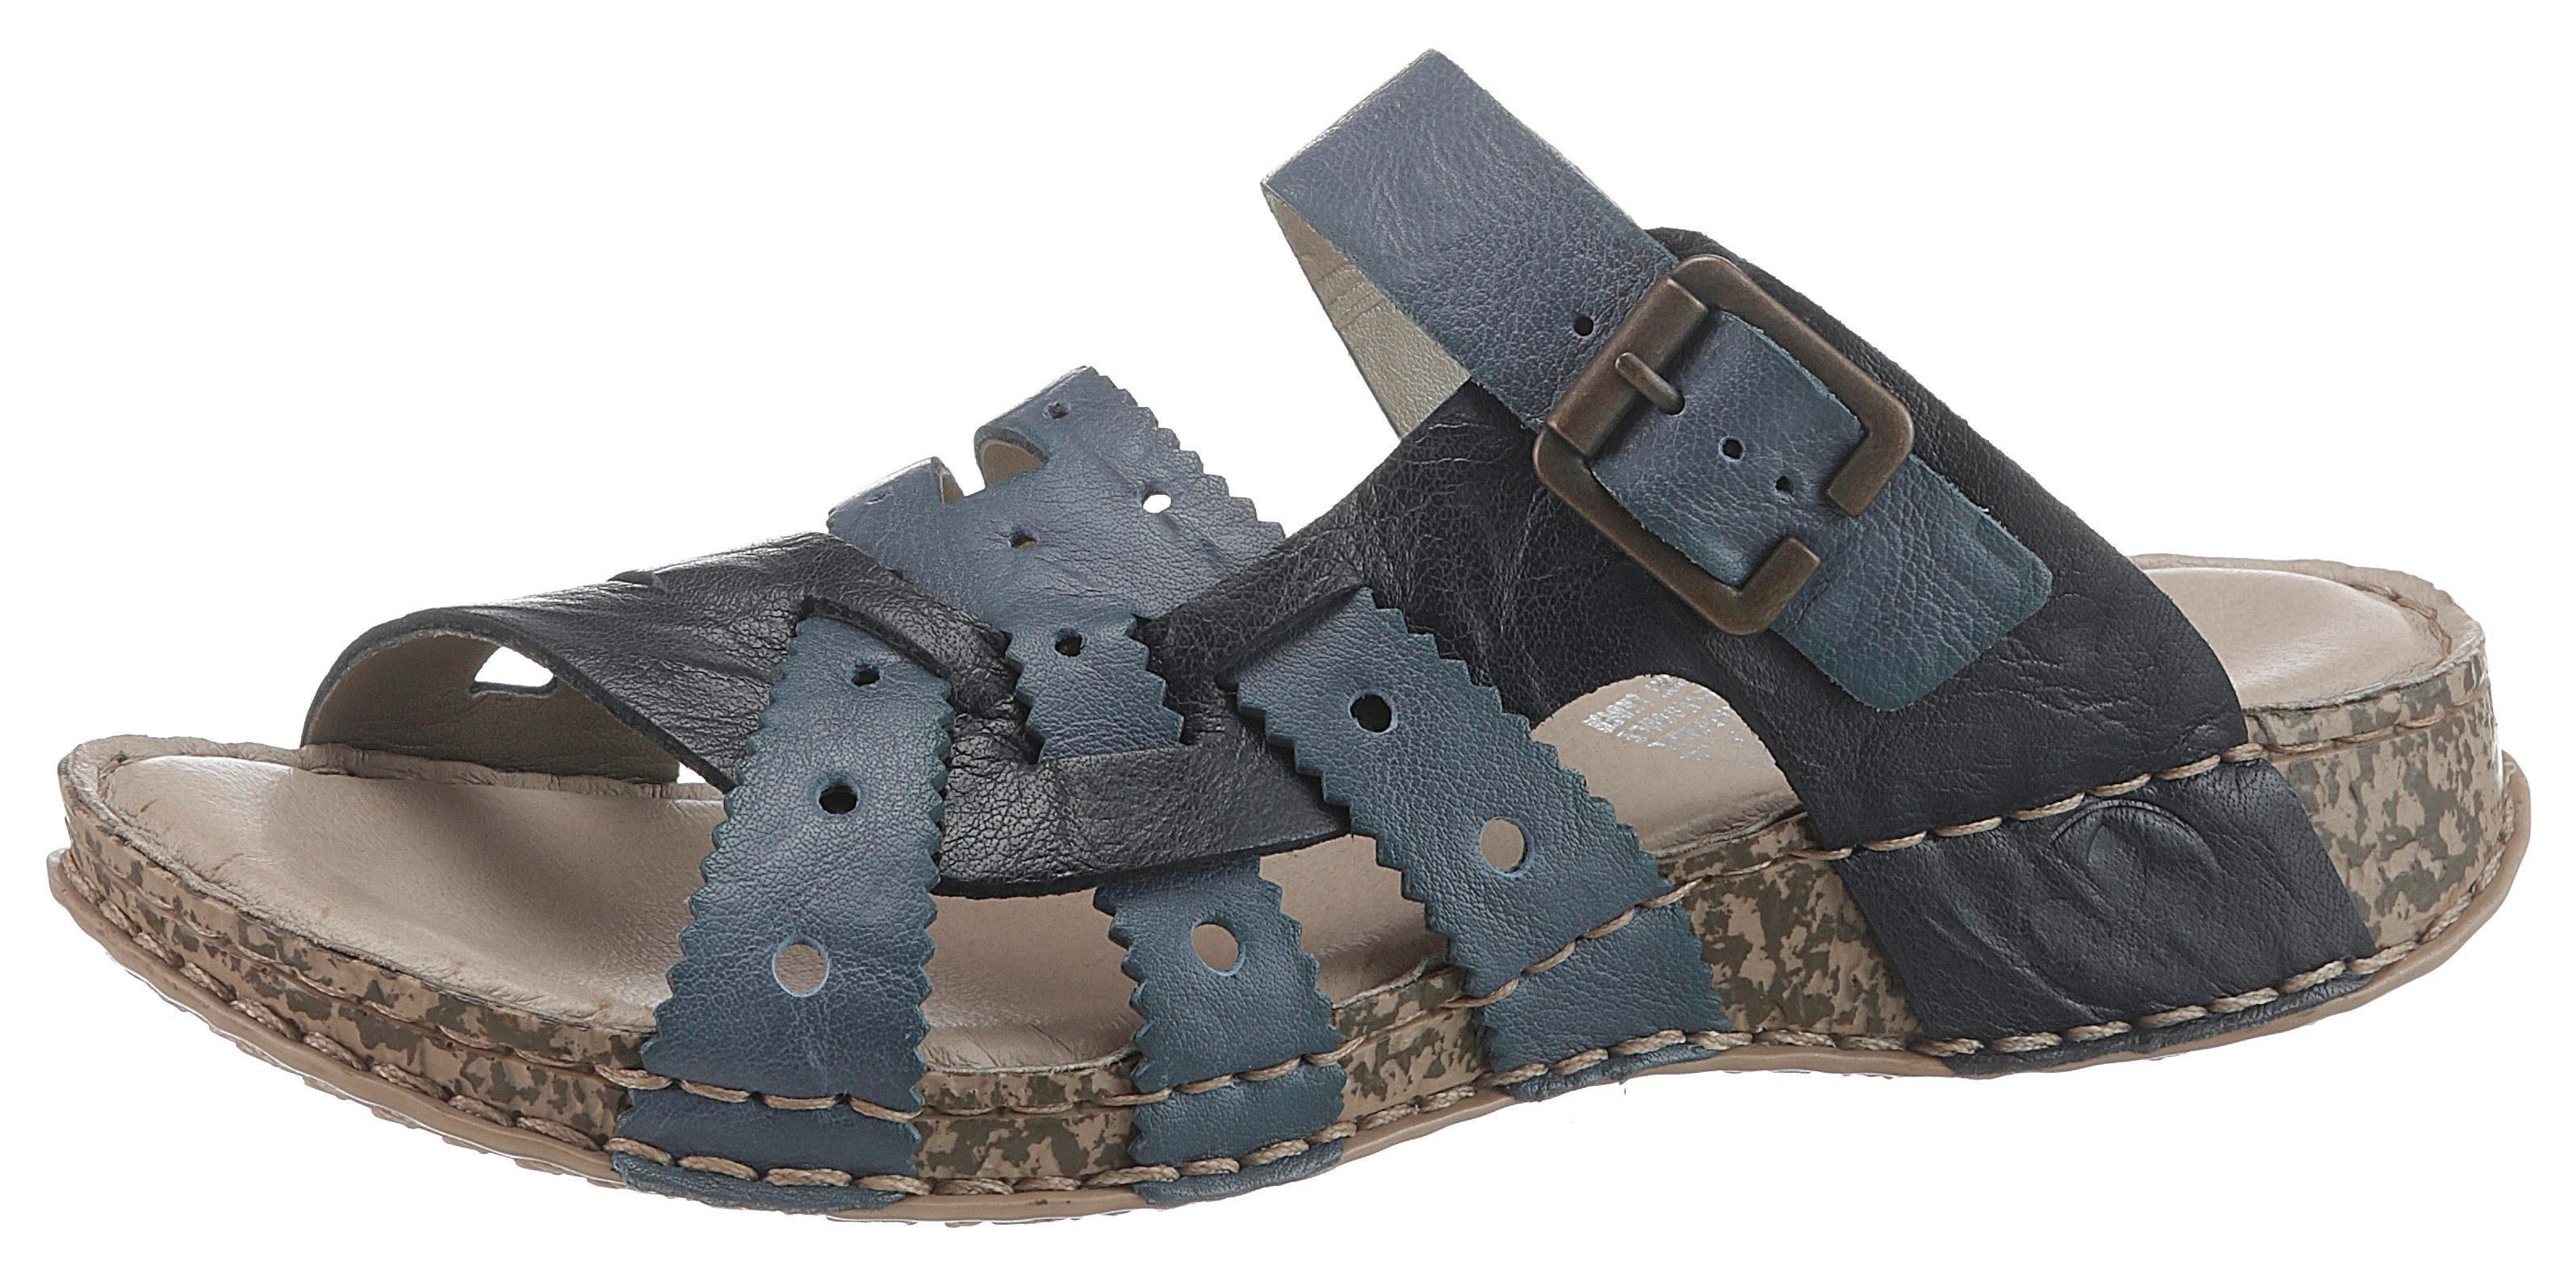 rieker regina sandals